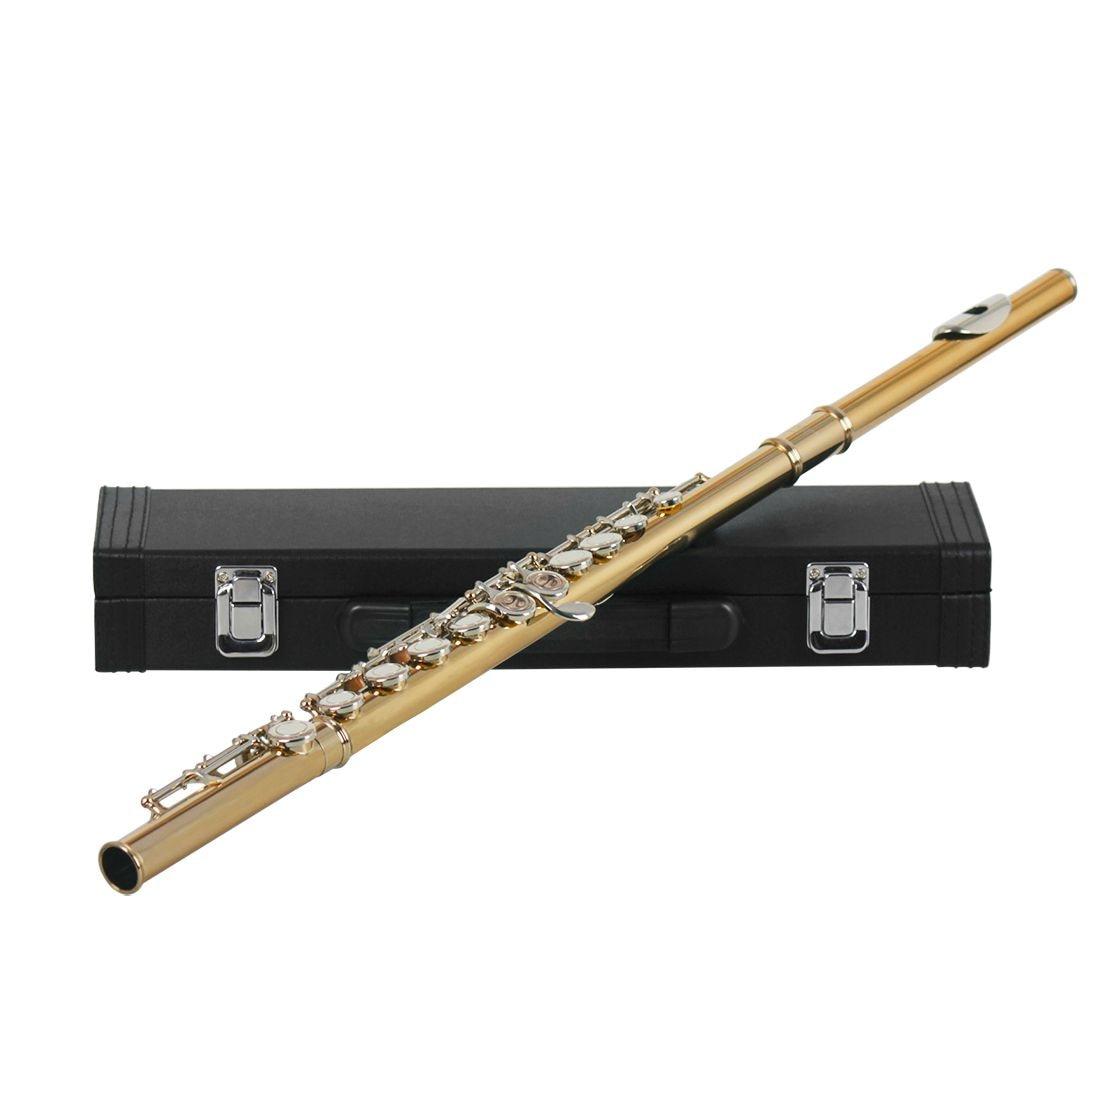 купить FSTE-Western Concert Flute 16 Holes C Key Cupronickel Musical Instrument with Cleaning Cloth Stick Gloves Screwdriver Gold по цене 4171.65 рублей